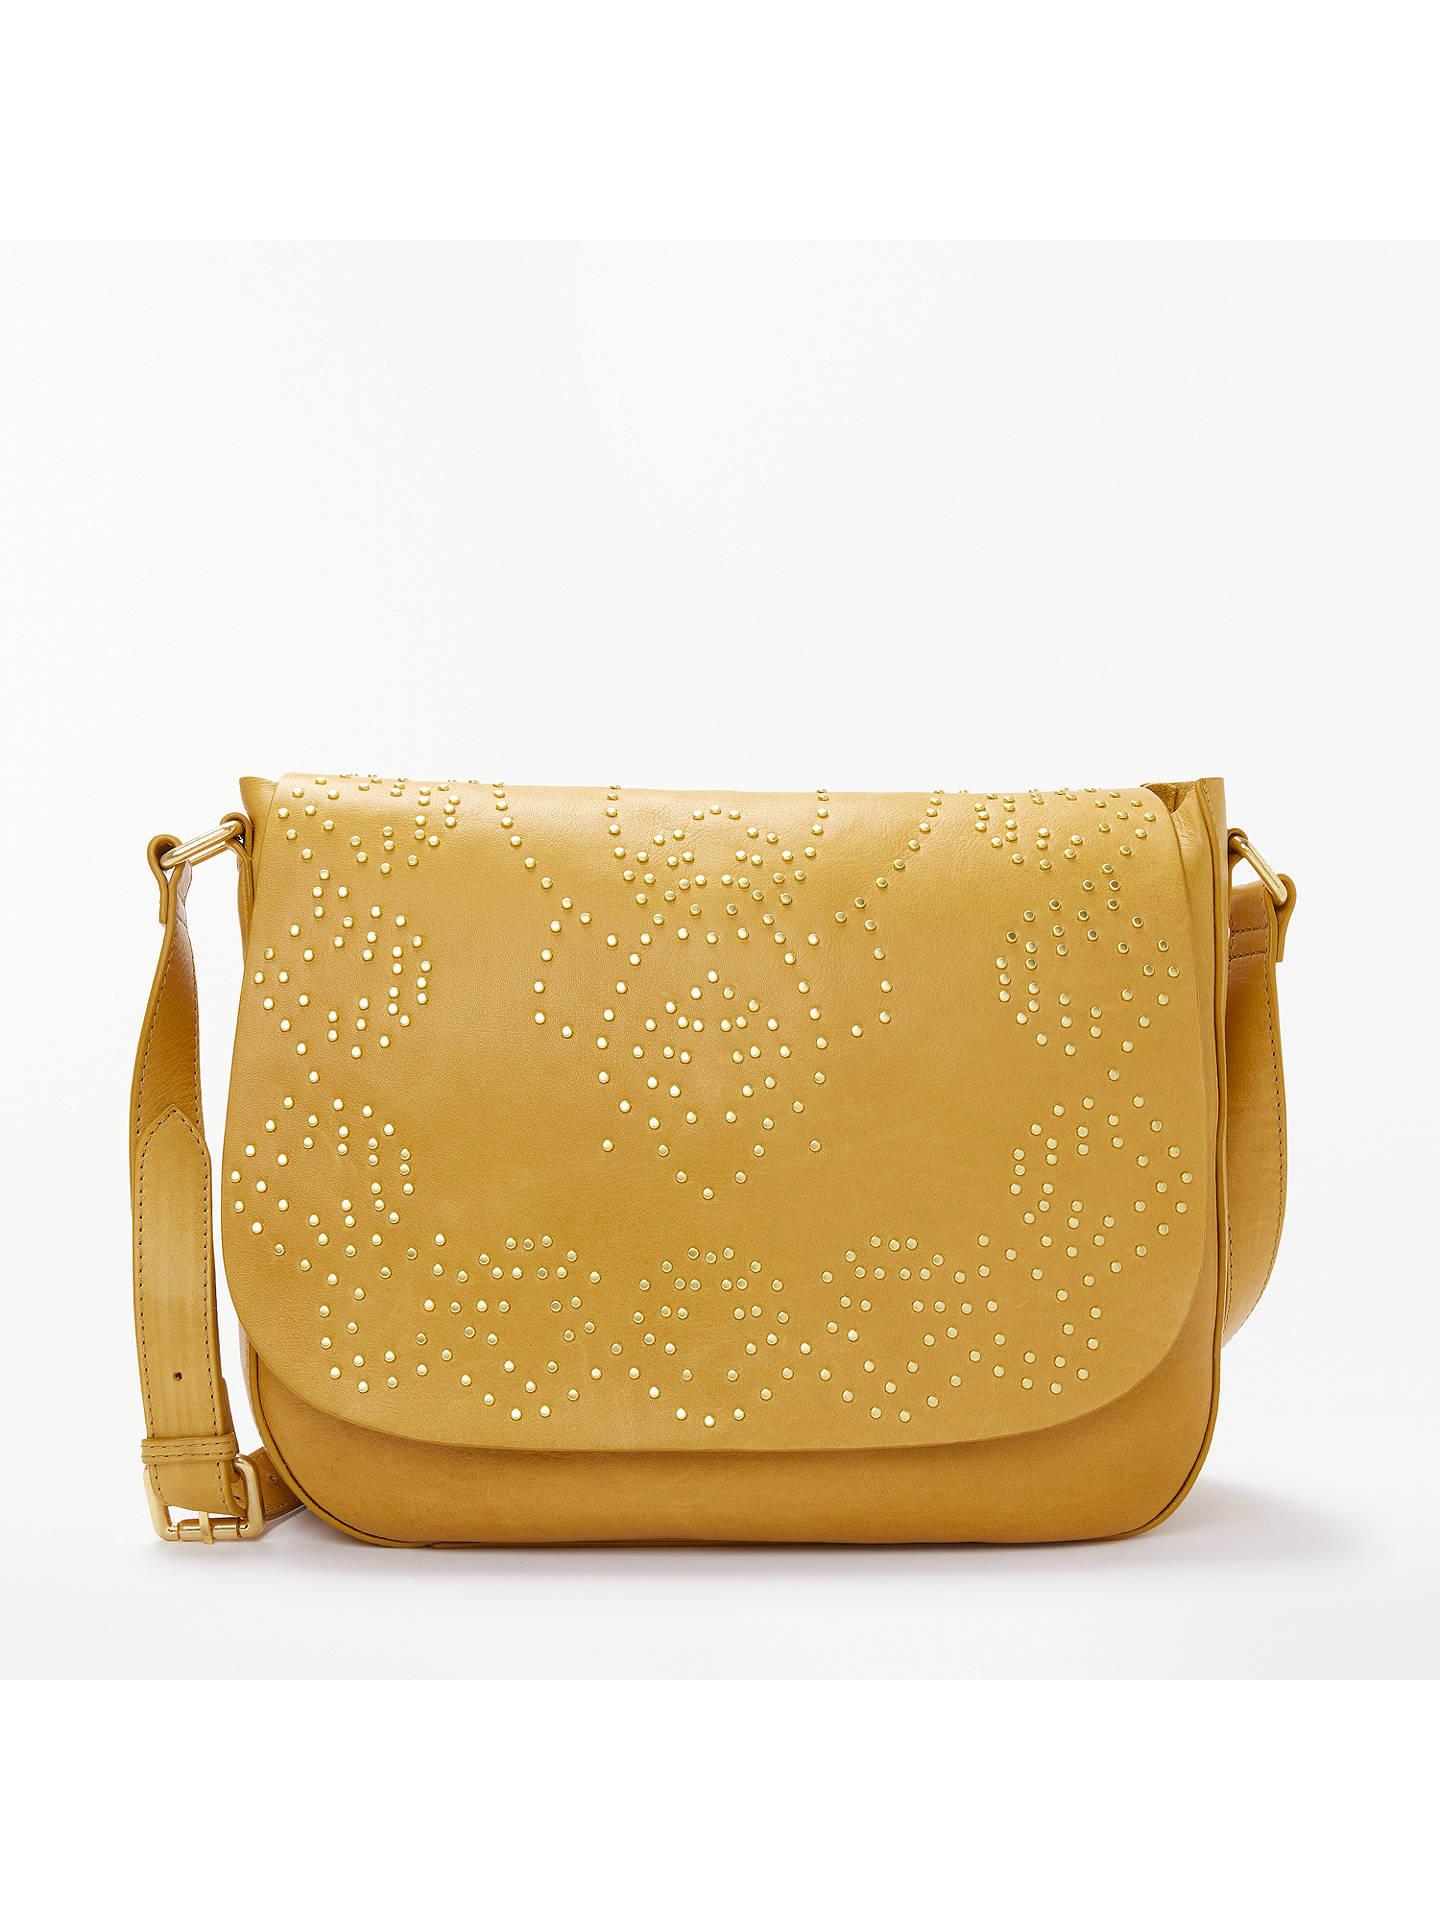 18fa98bed0 Buy AND OR Isabella Leather Stud Shoulder Bag